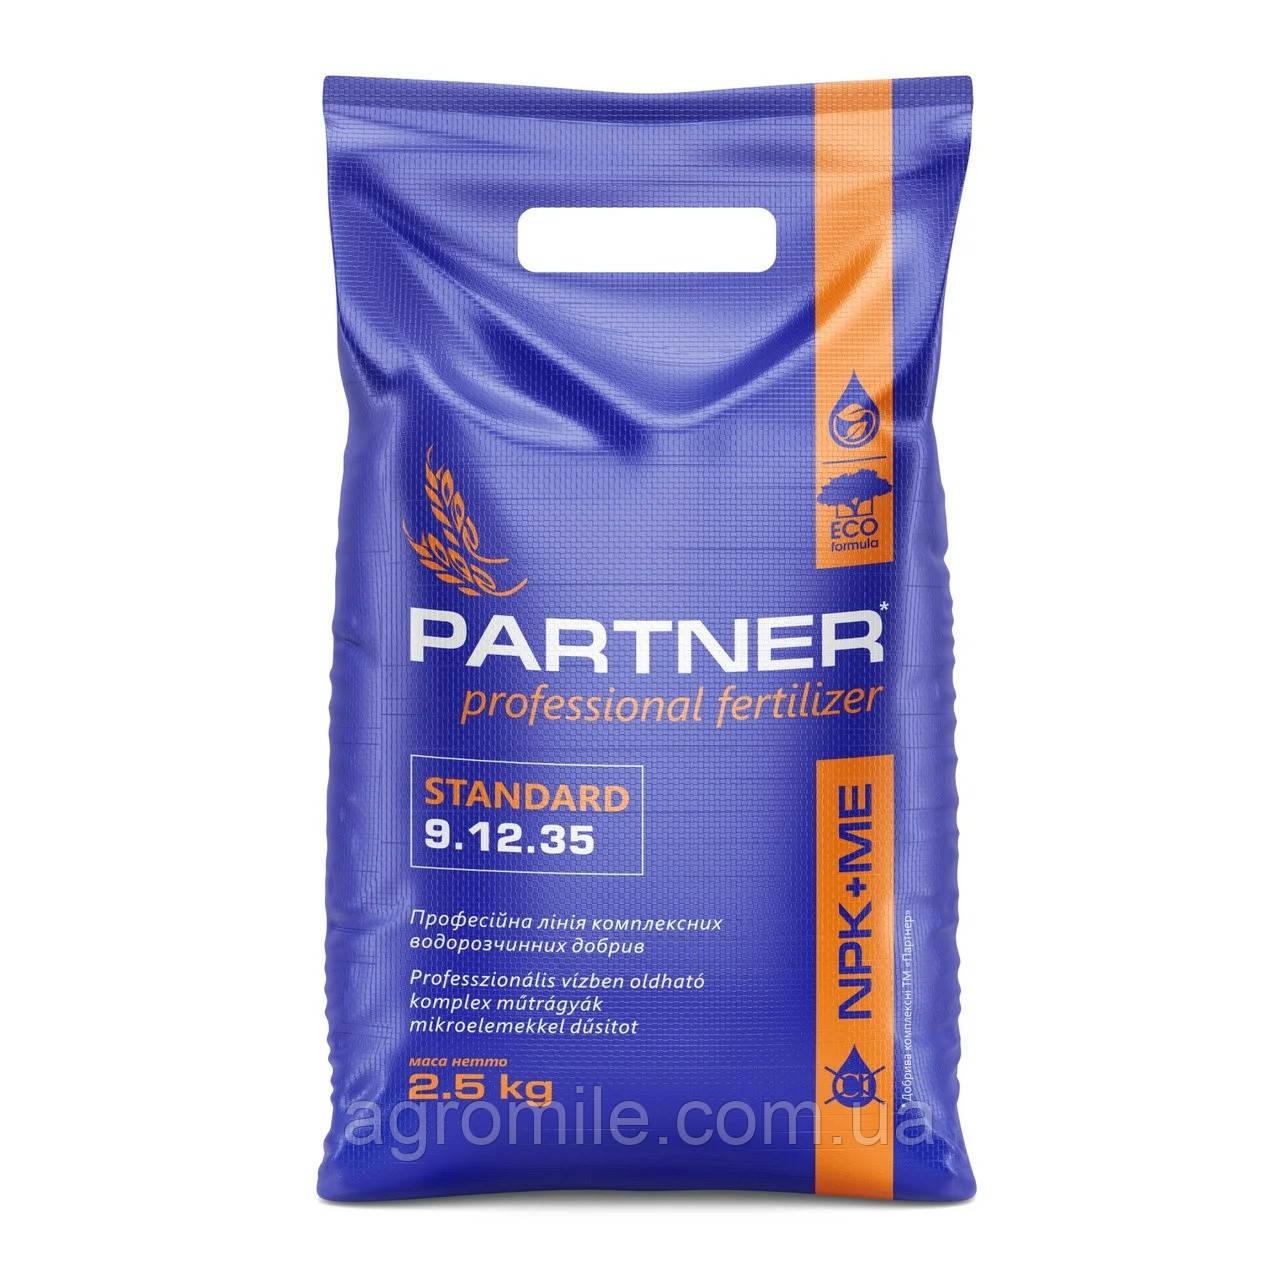 Добриво Partner Standard NPK NPK 9.12.35+S+MG+МЕ (2,5 кг)